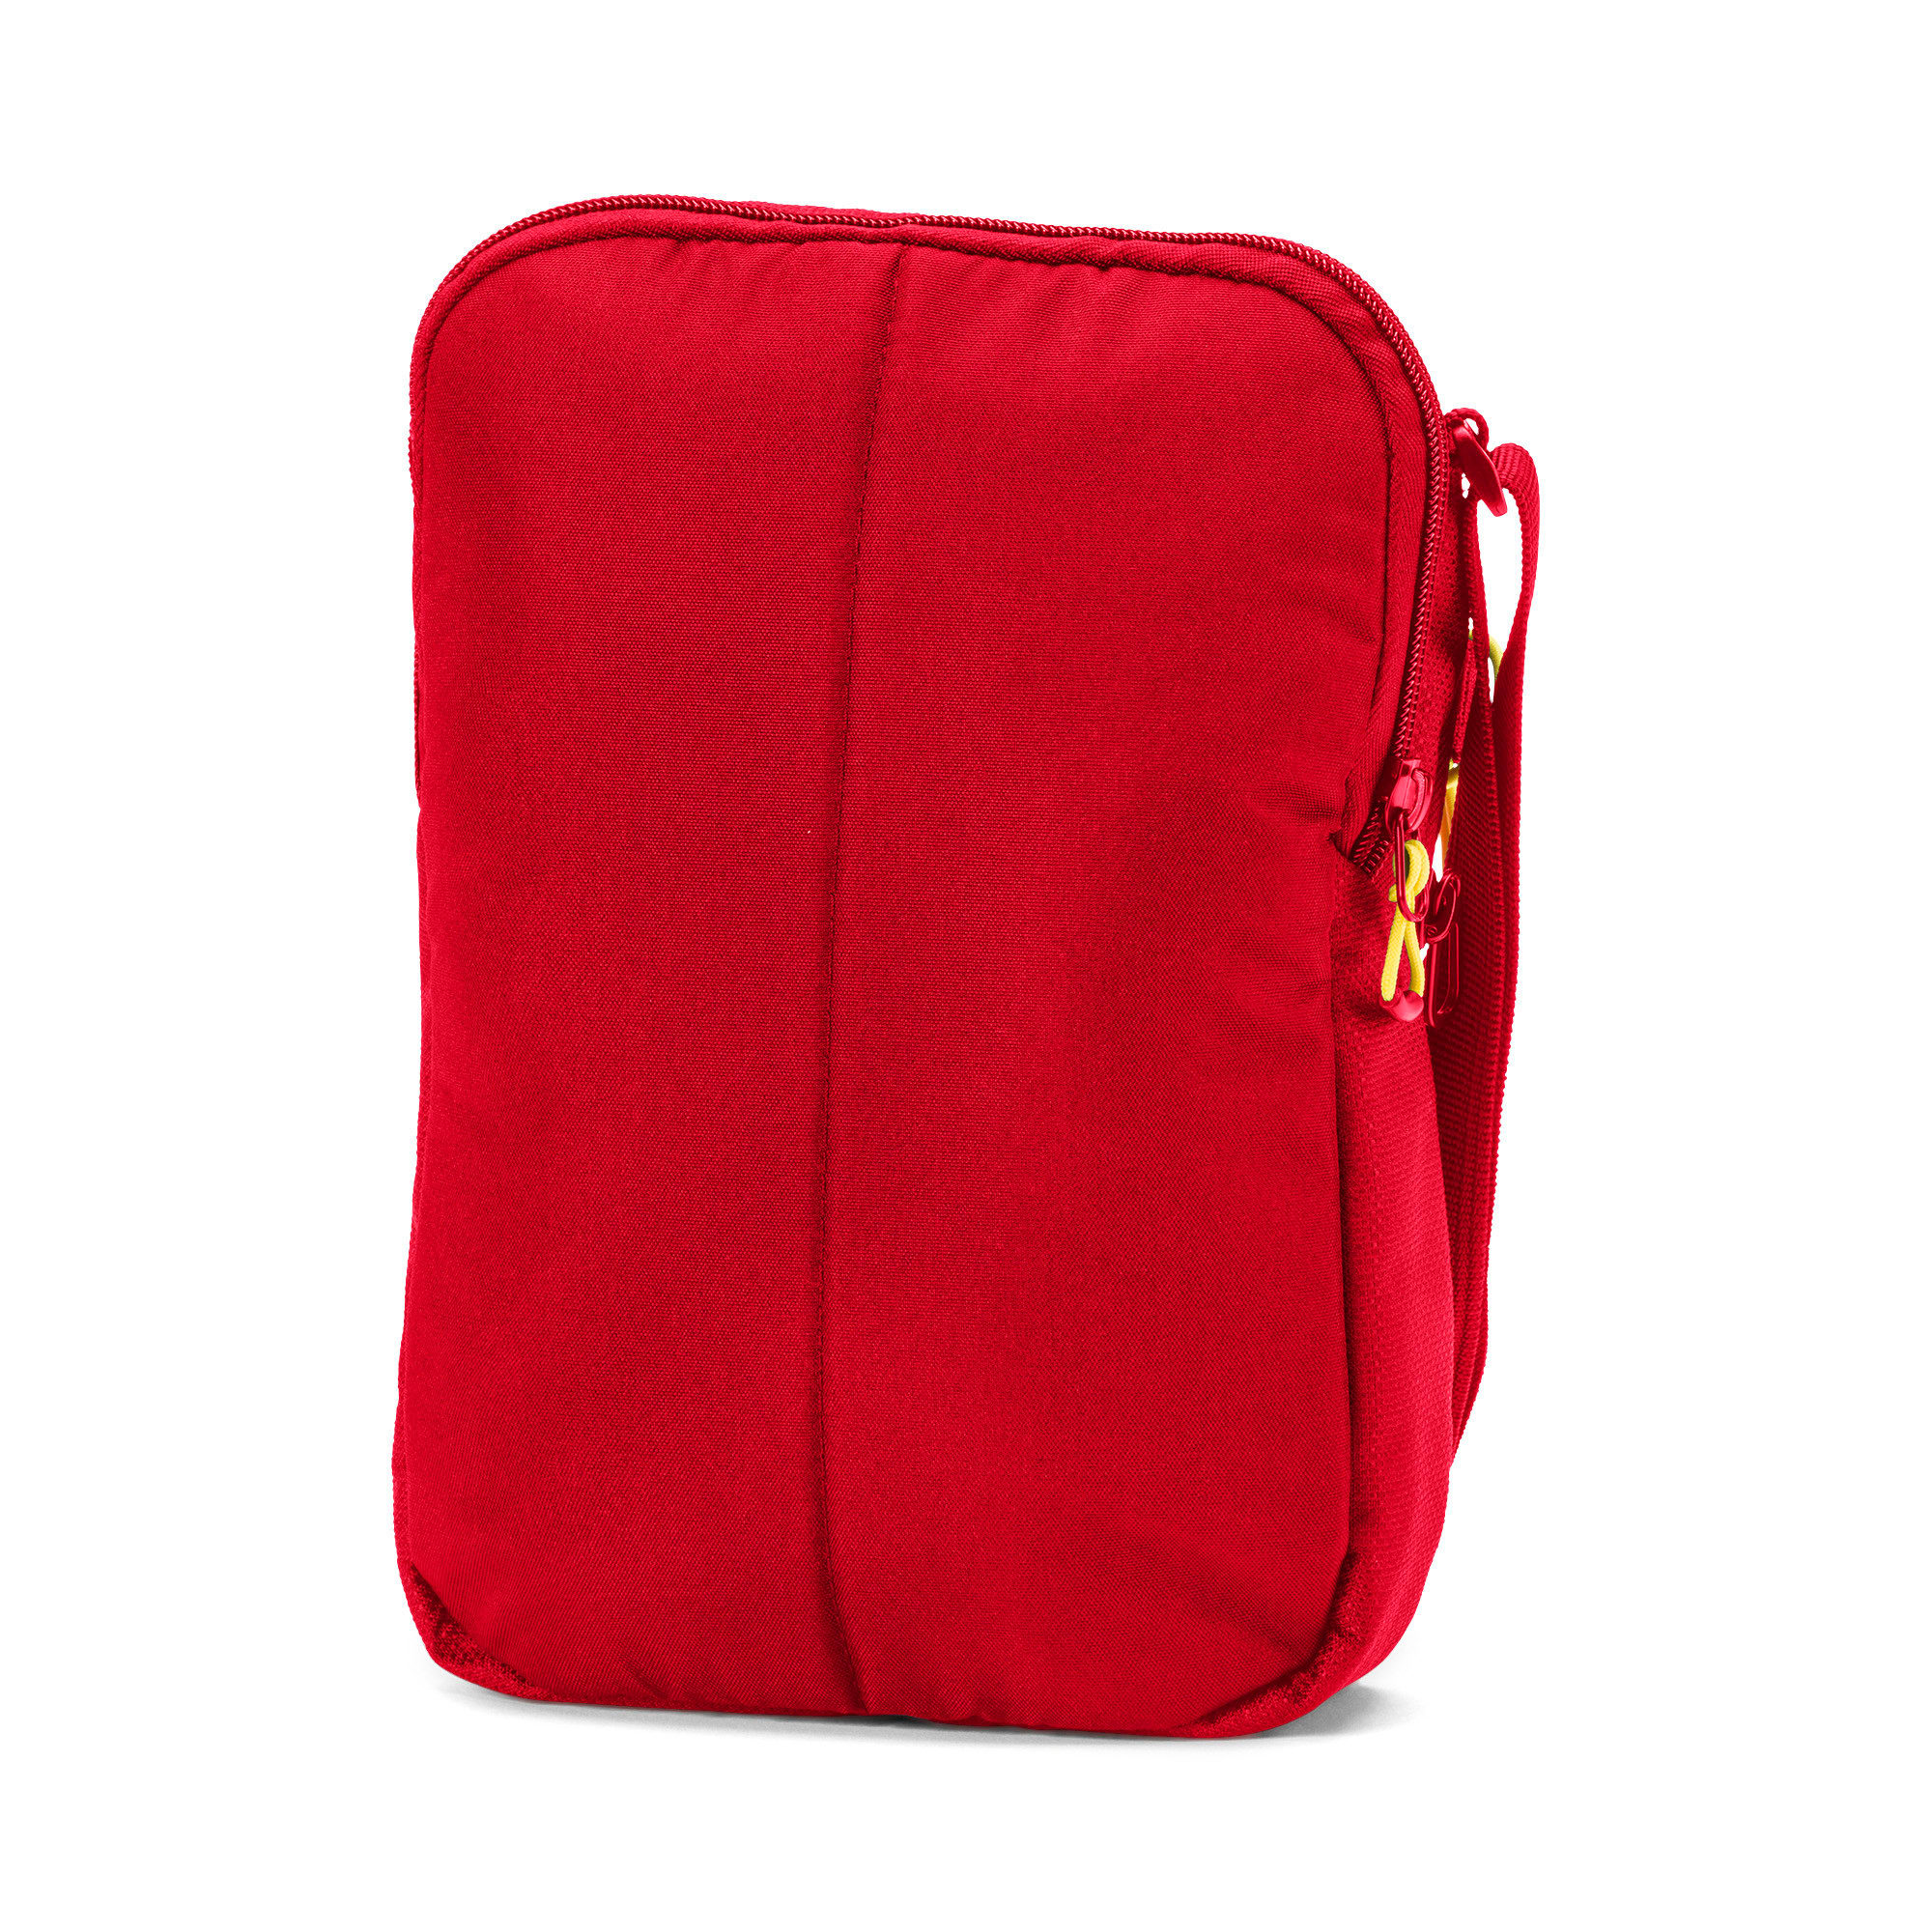 Thumbnail 2 of Scuderia Ferrari Fanwear Portable Bag, Rosso Corsa, medium